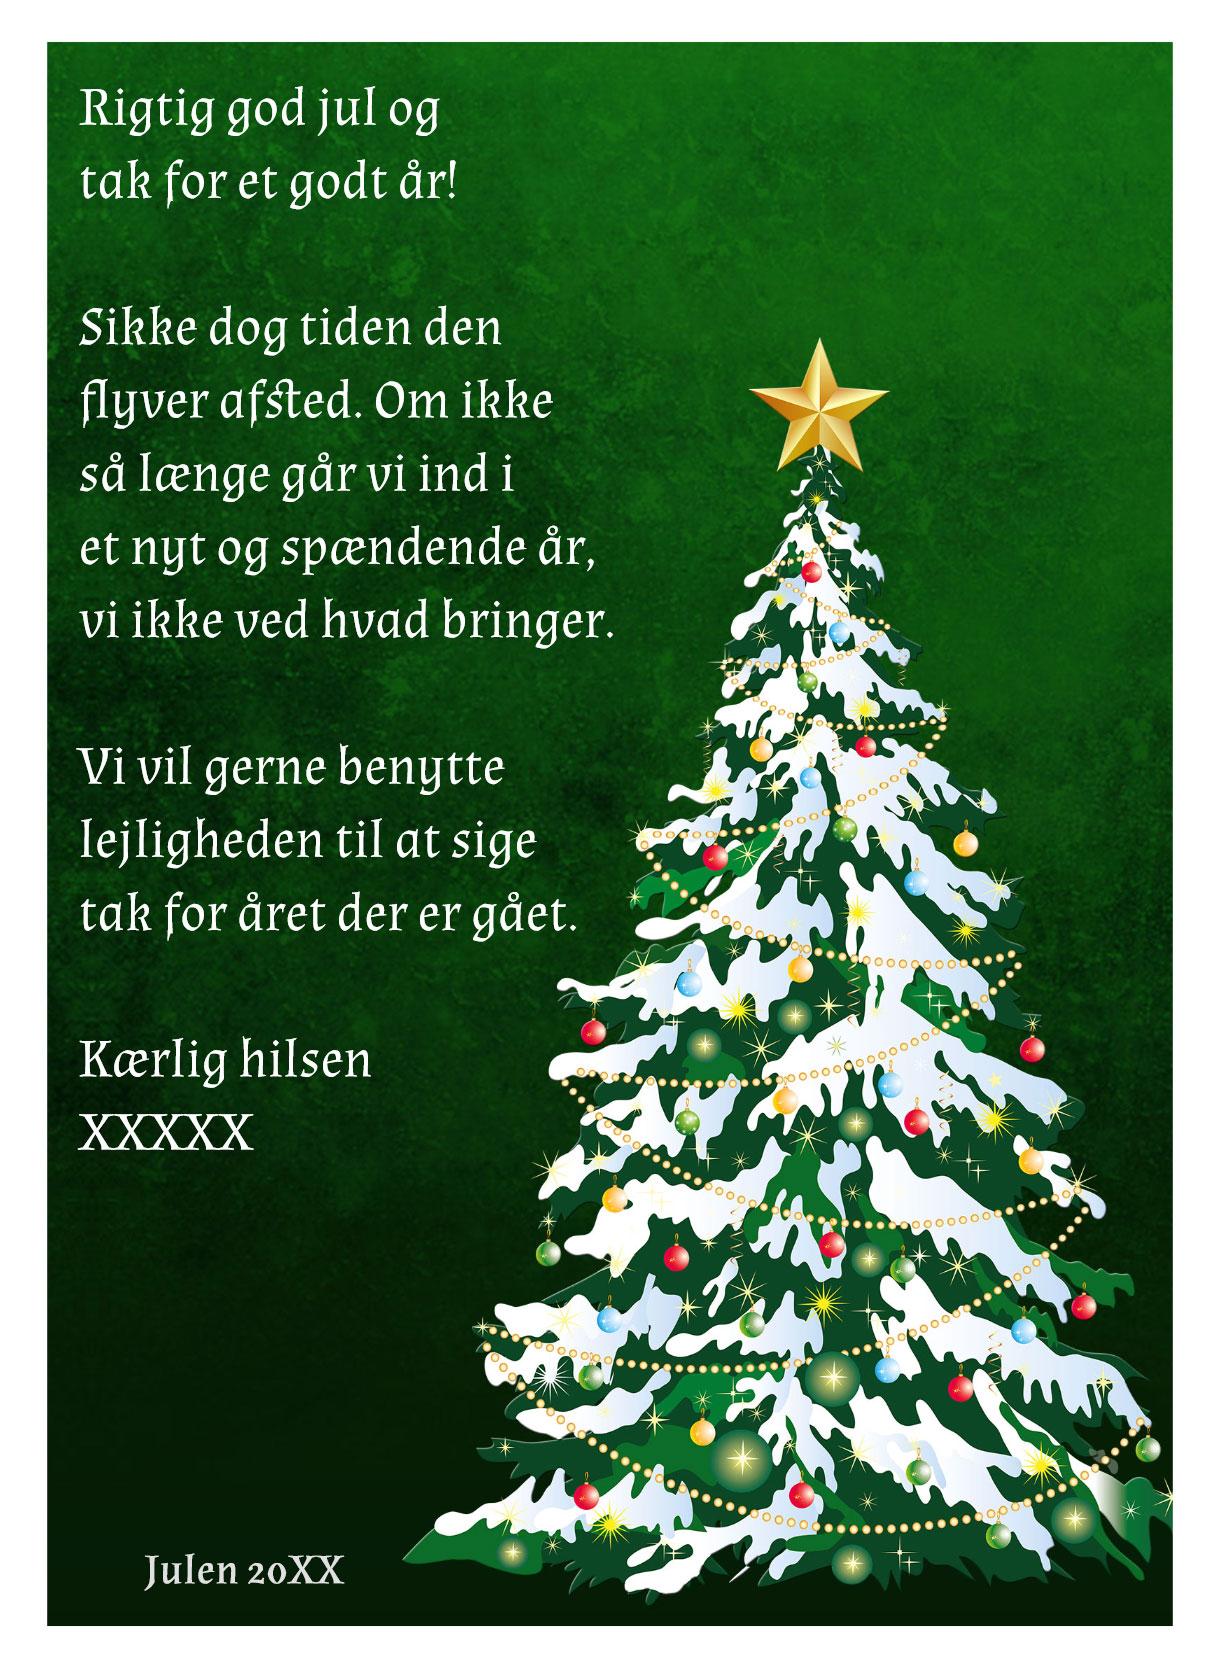 Julekort med musik og sang nr 6